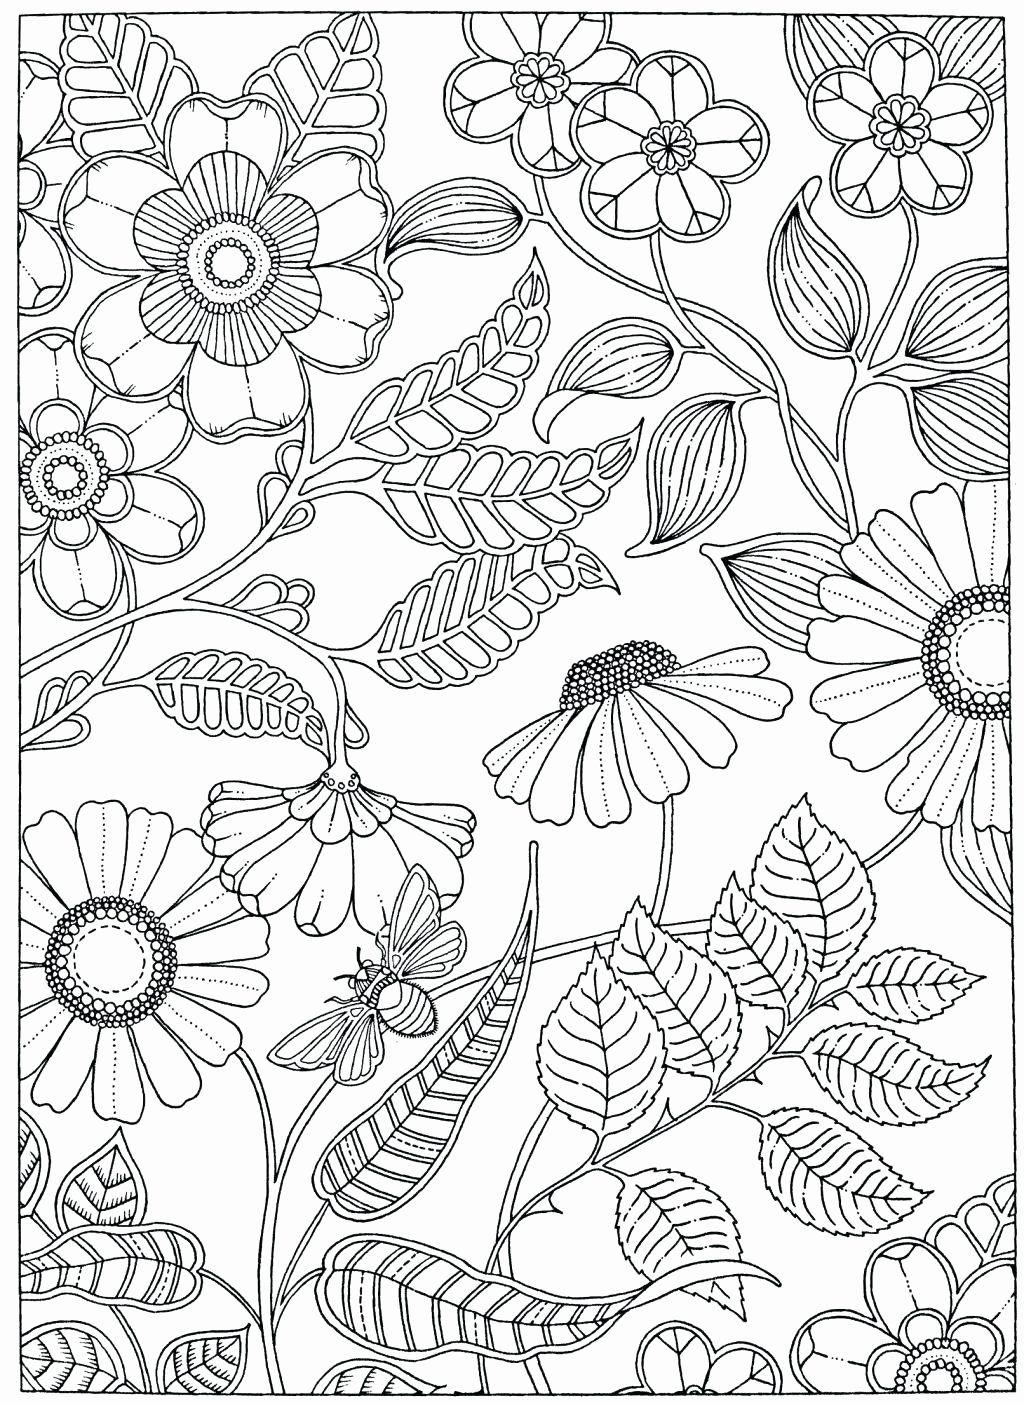 Vegetable Garden Coloring Sheet Fresh Free Printable Garden Coloring Pages Allenfines Garden Coloring Pages Flower Coloring Pages Secret Garden Coloring Book